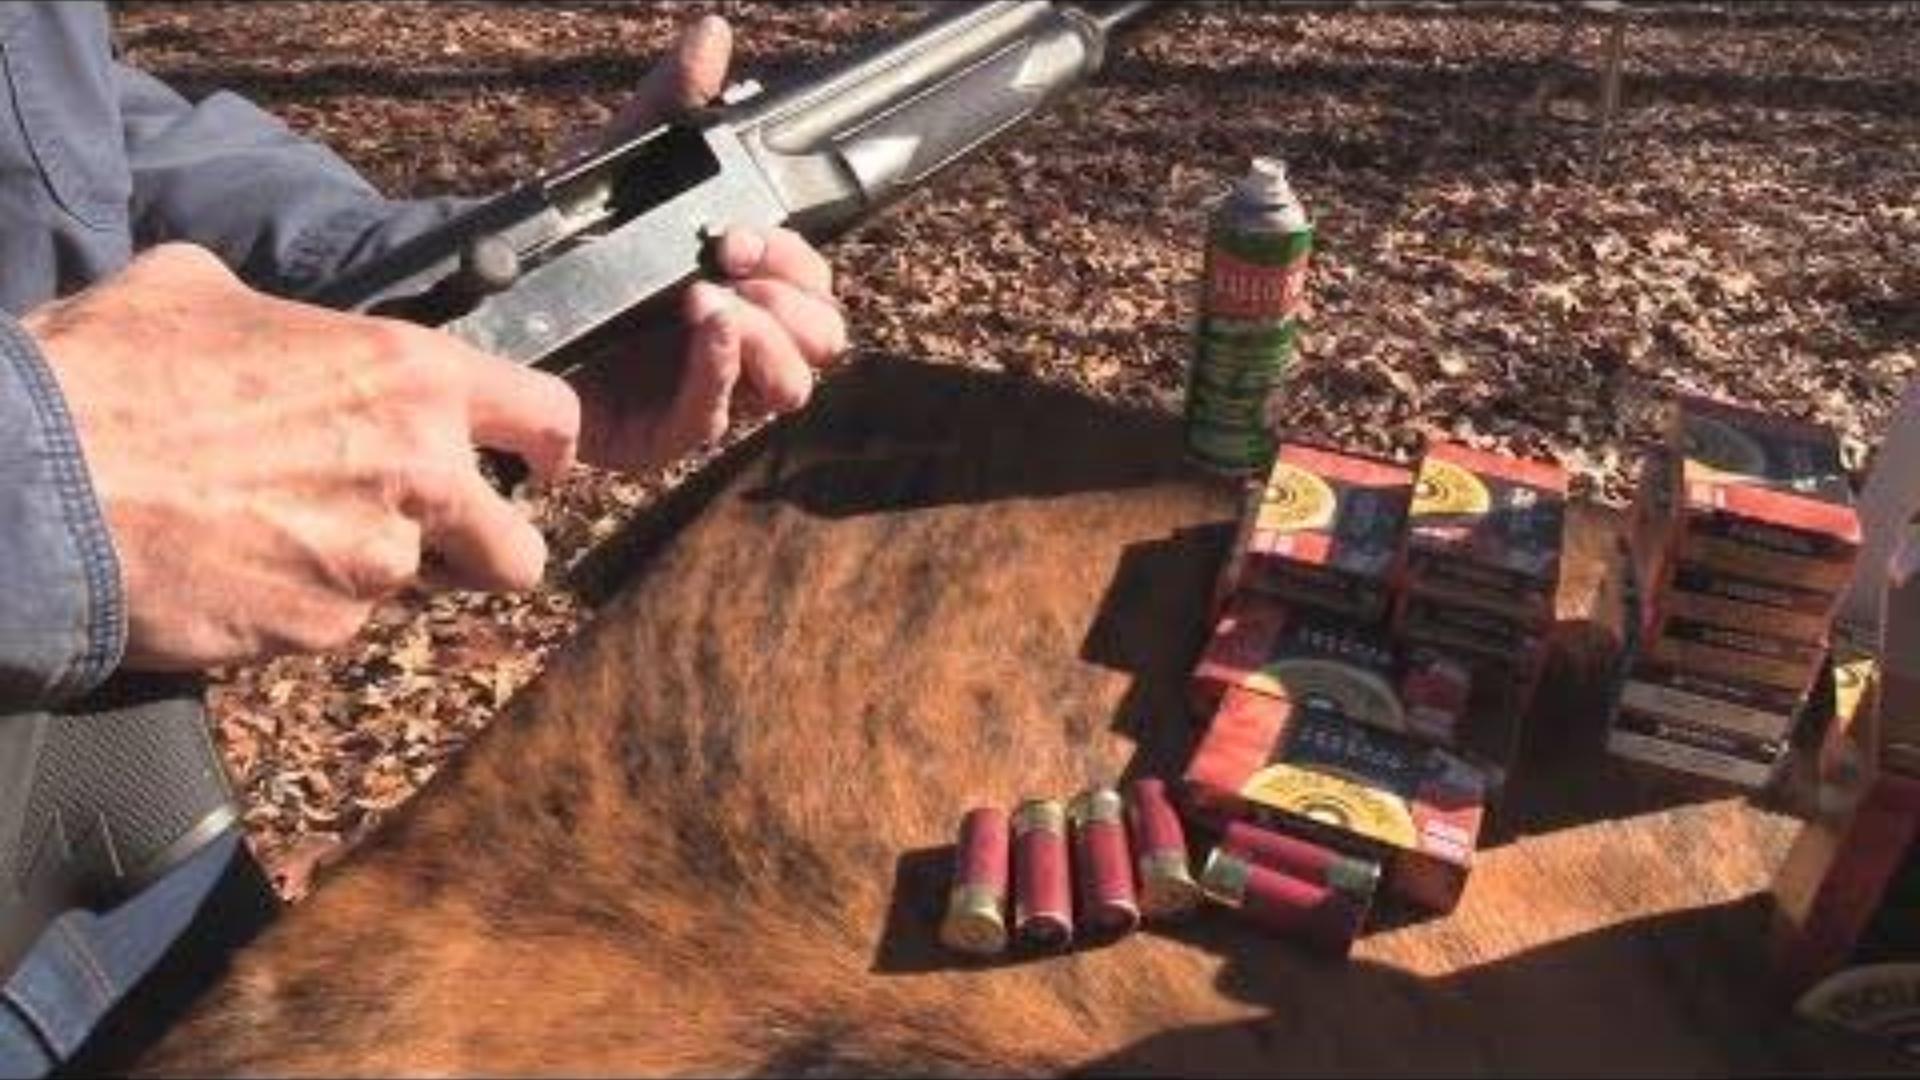 [hickok45]伯奈利Super90霰弹枪30周年纪念款